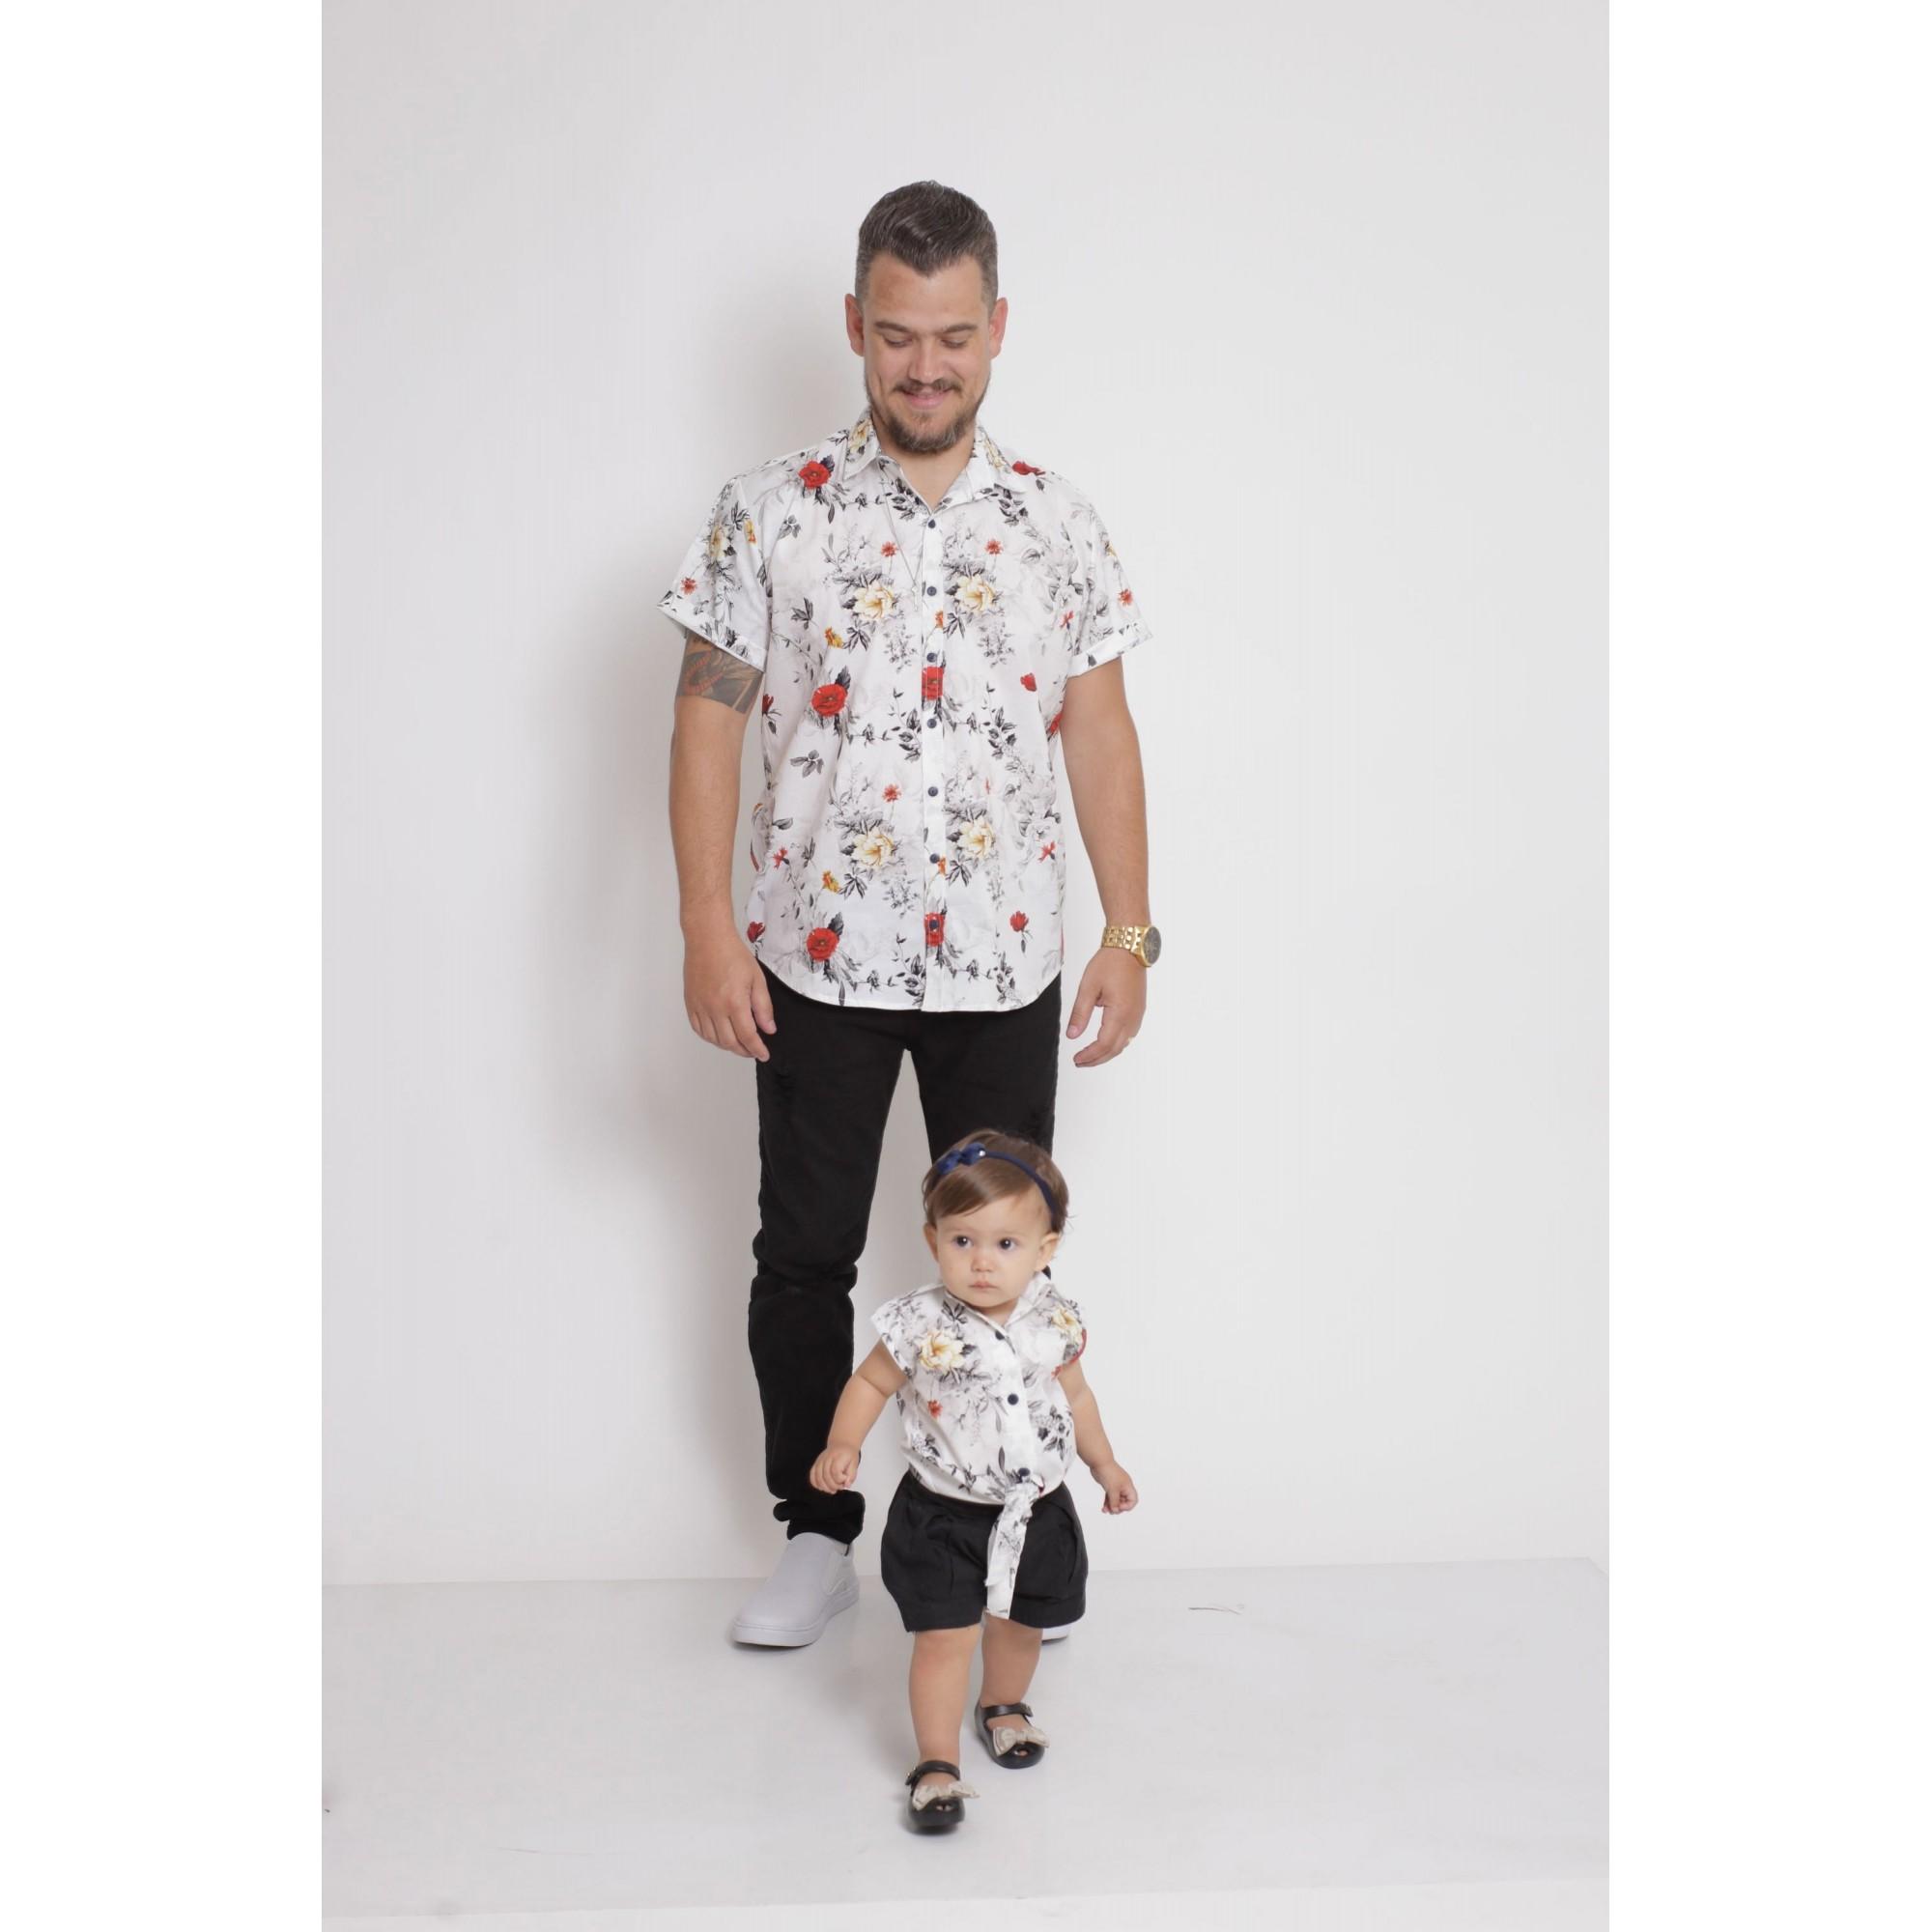 PAI E FILHA > Kit 02 Camisas Manga Curta Branca Floral [Coleção Tal Pai Tal Filha]  - Heitor Fashion Brazil